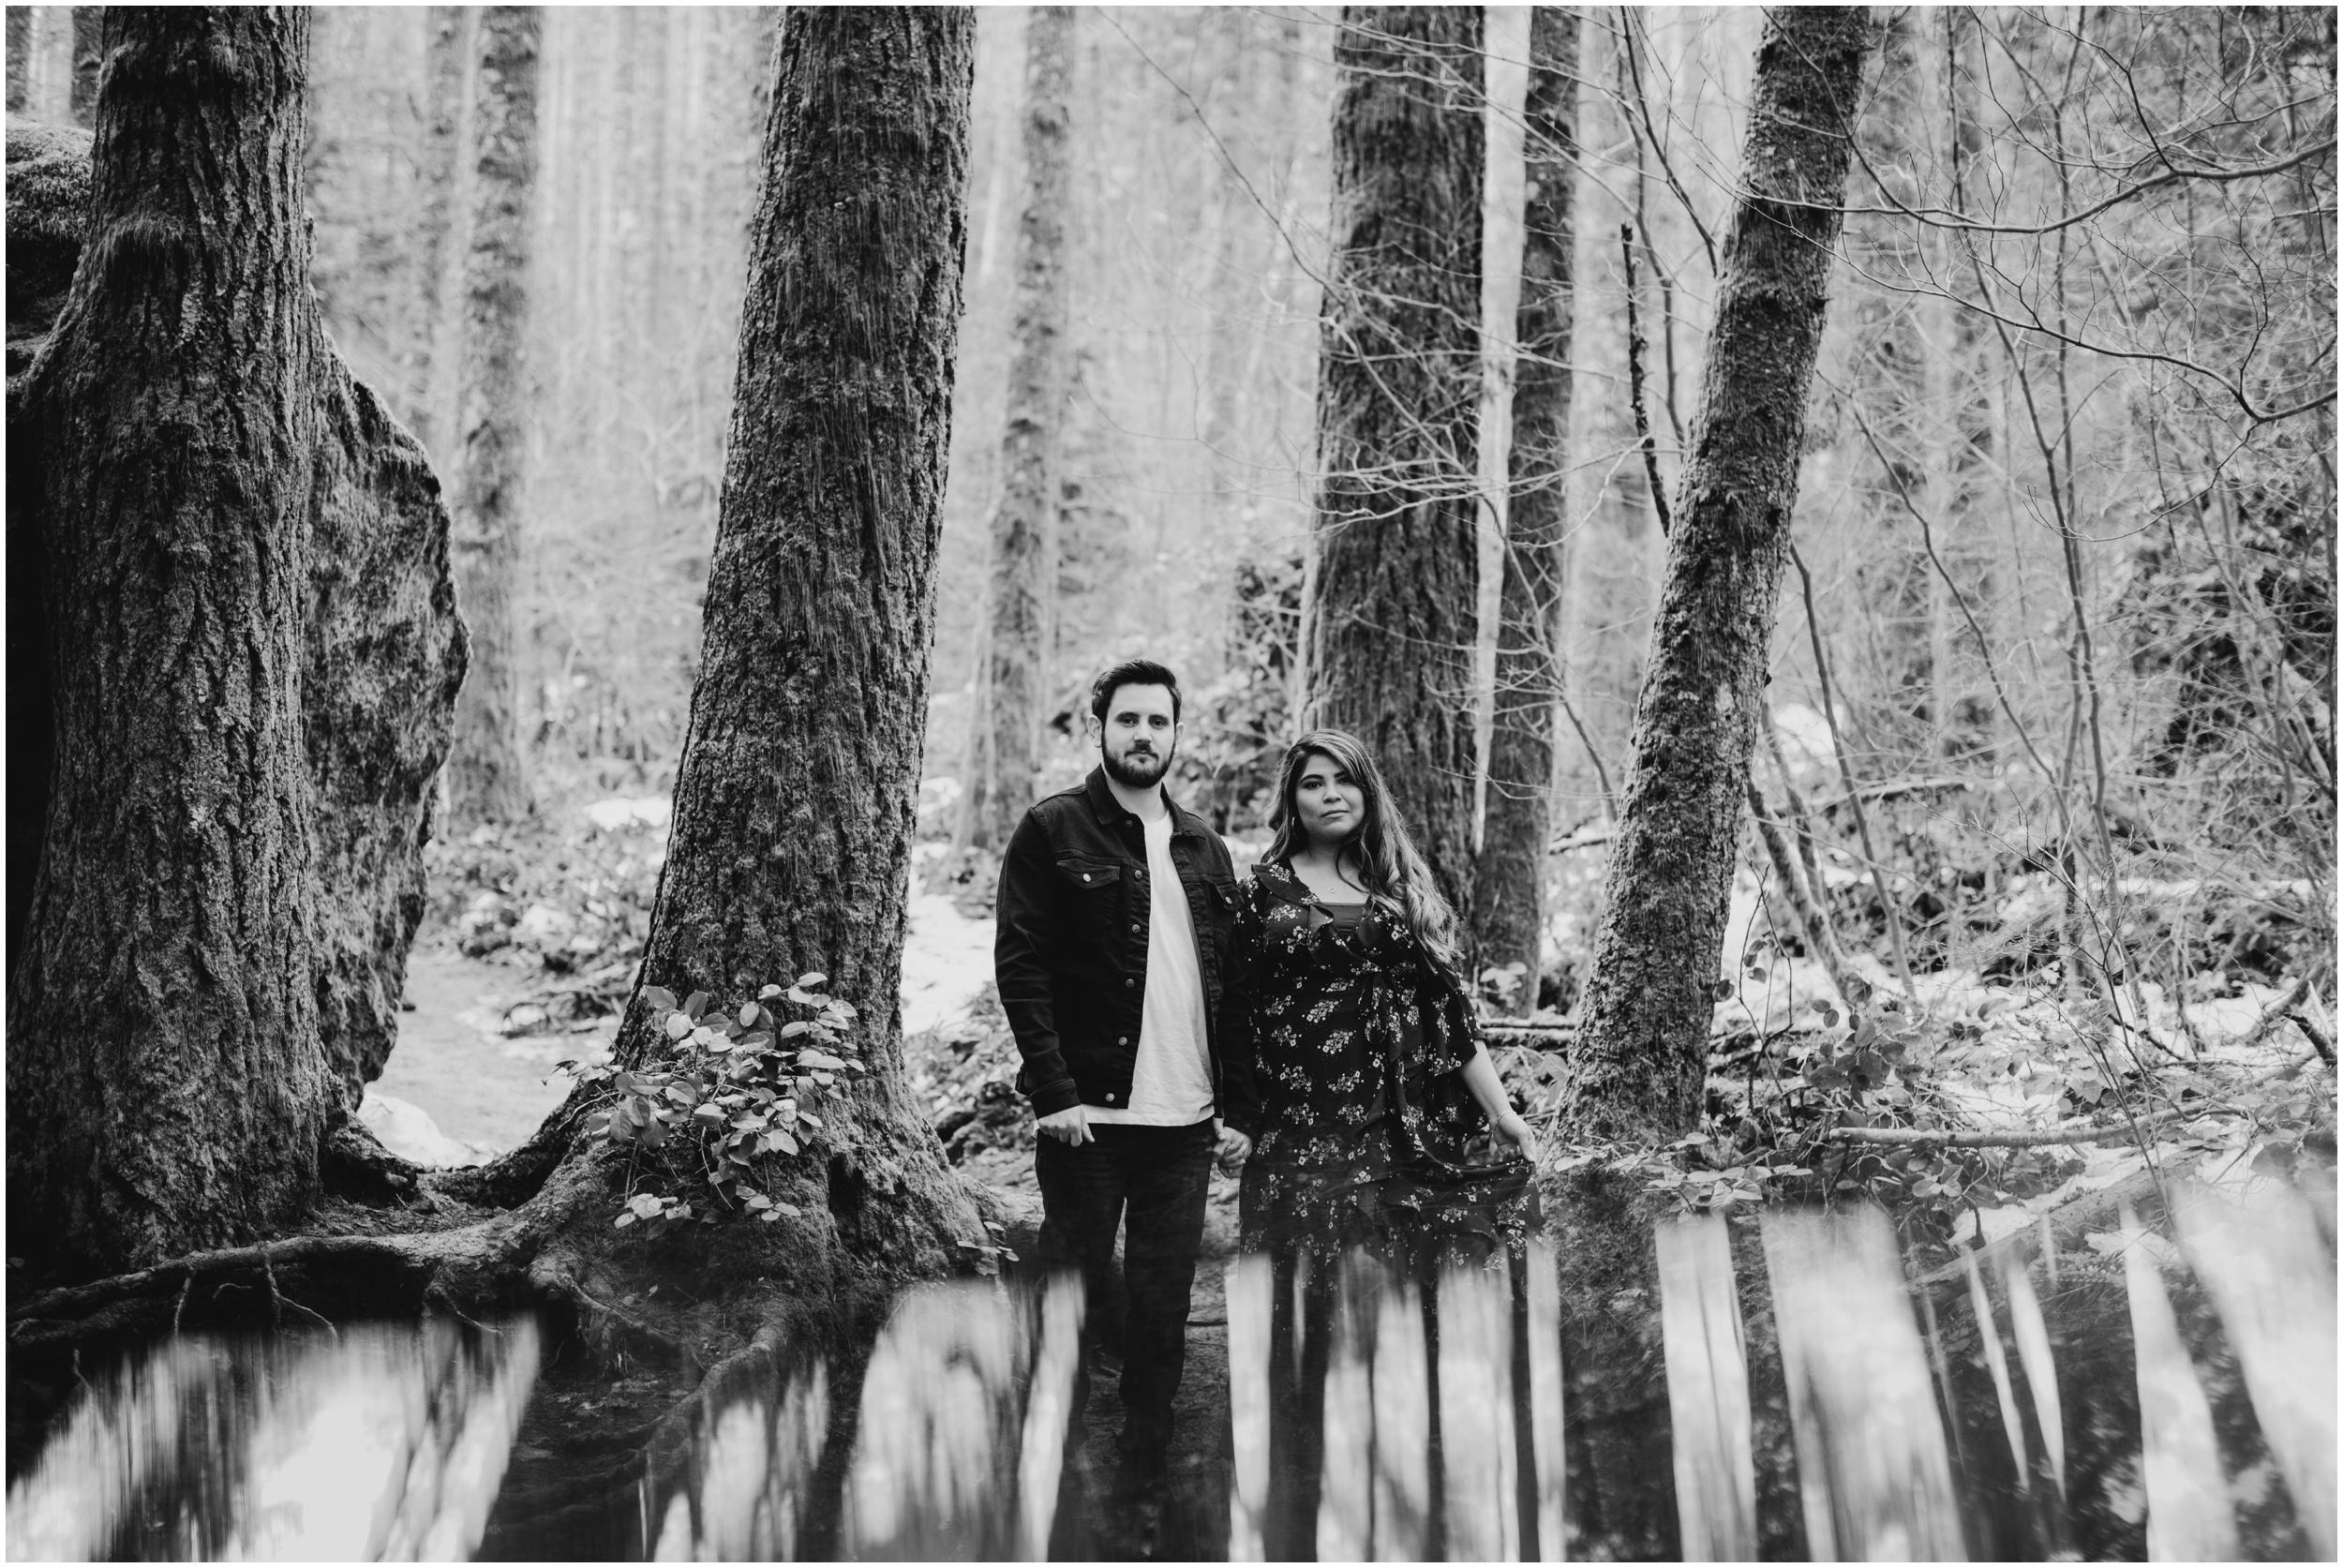 couples photoshoot at Rattlesnake Lake, WA   Seattle Wedding Photographer www.riversandroadsphotography.com